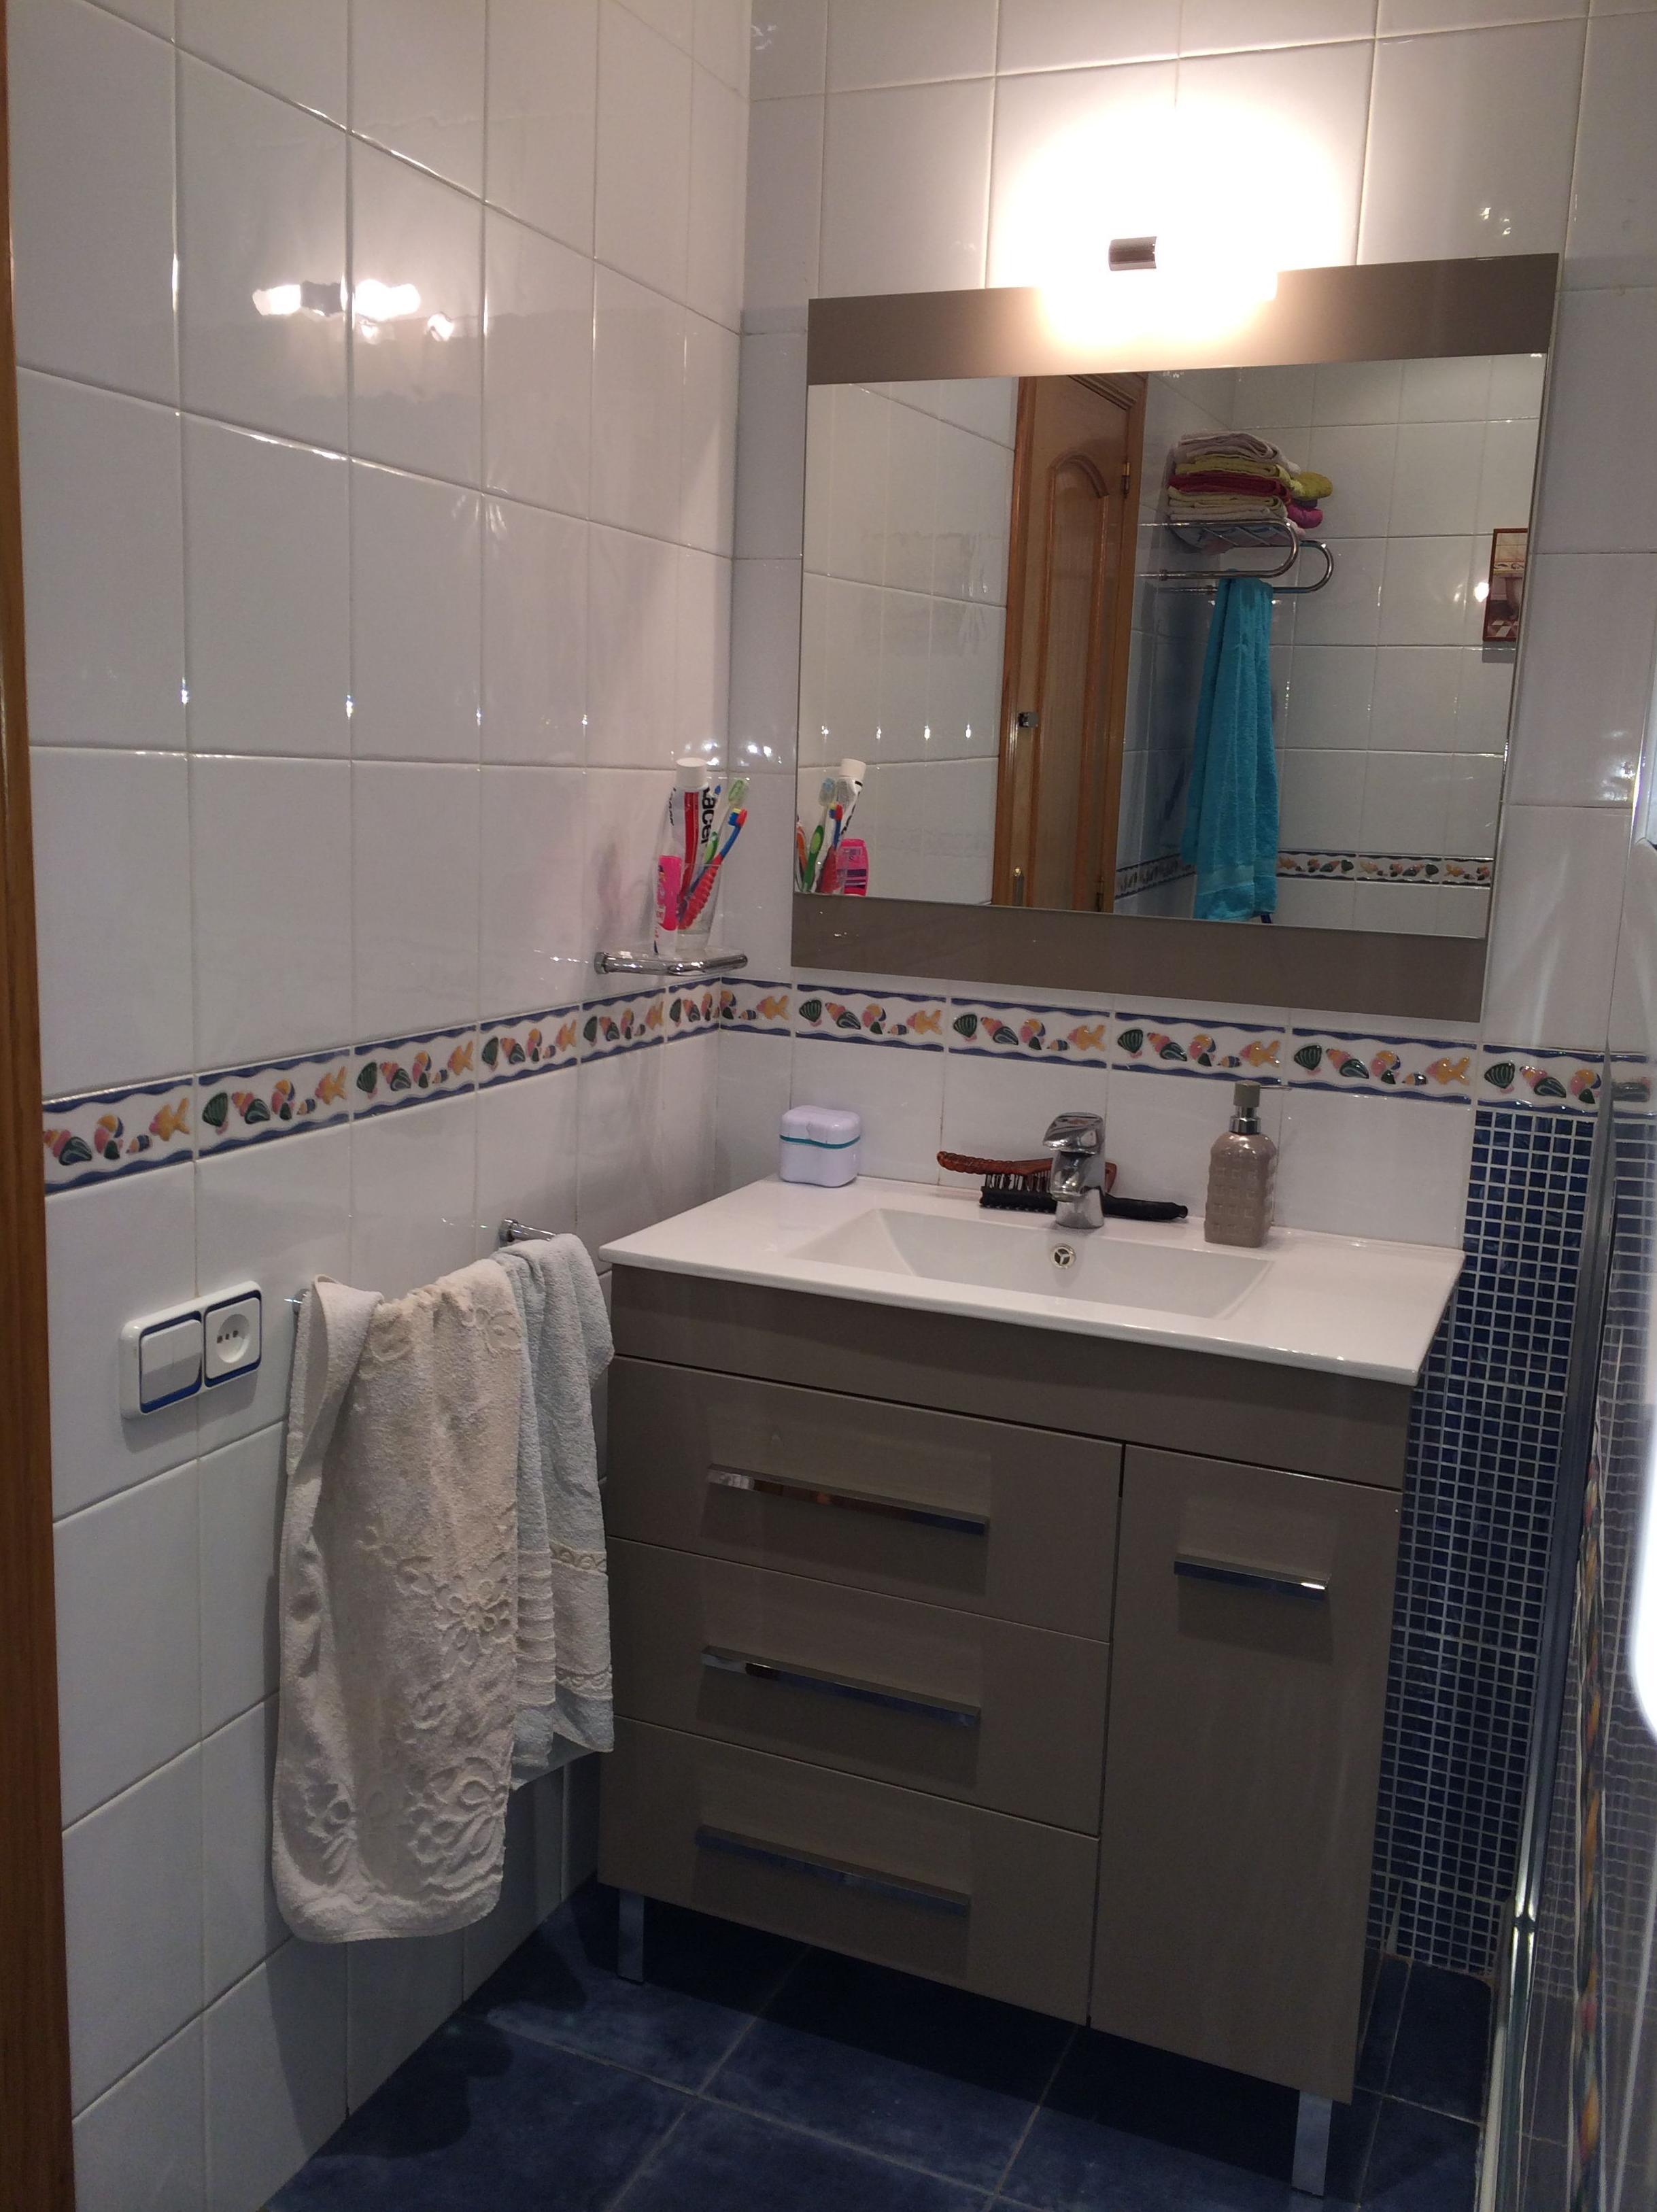 Cambio de bañera por plato de ducha \u002D mueble de baño Torvisco modelo Niger